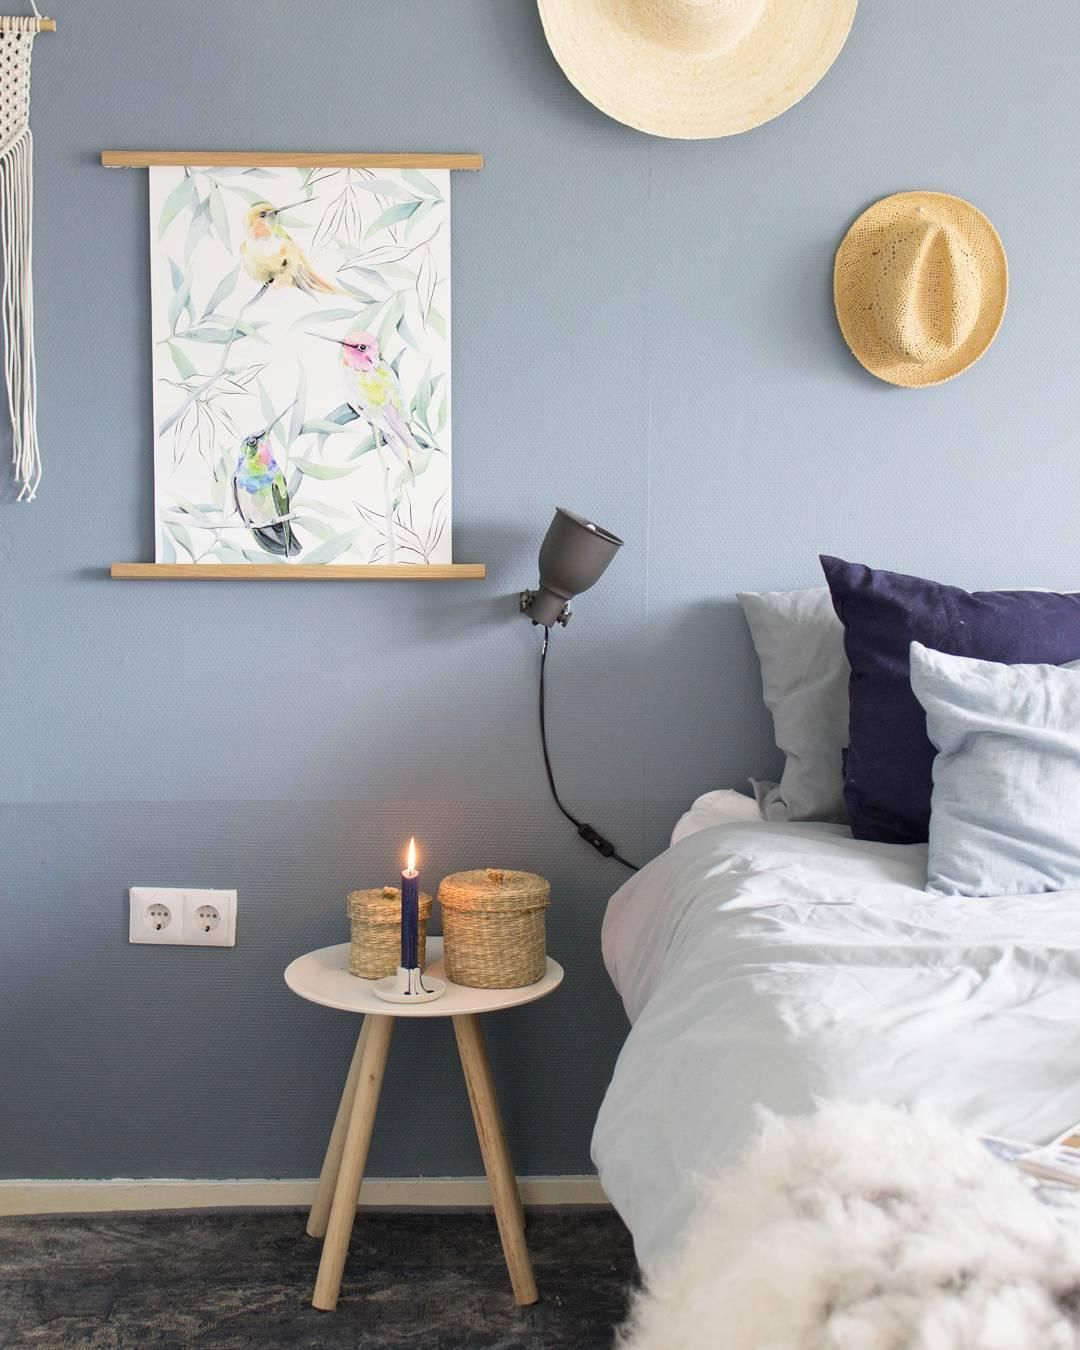 Wandfarbe Steinblaue Sch Nheit Cozy Interiors And Room # Muebles Farbton